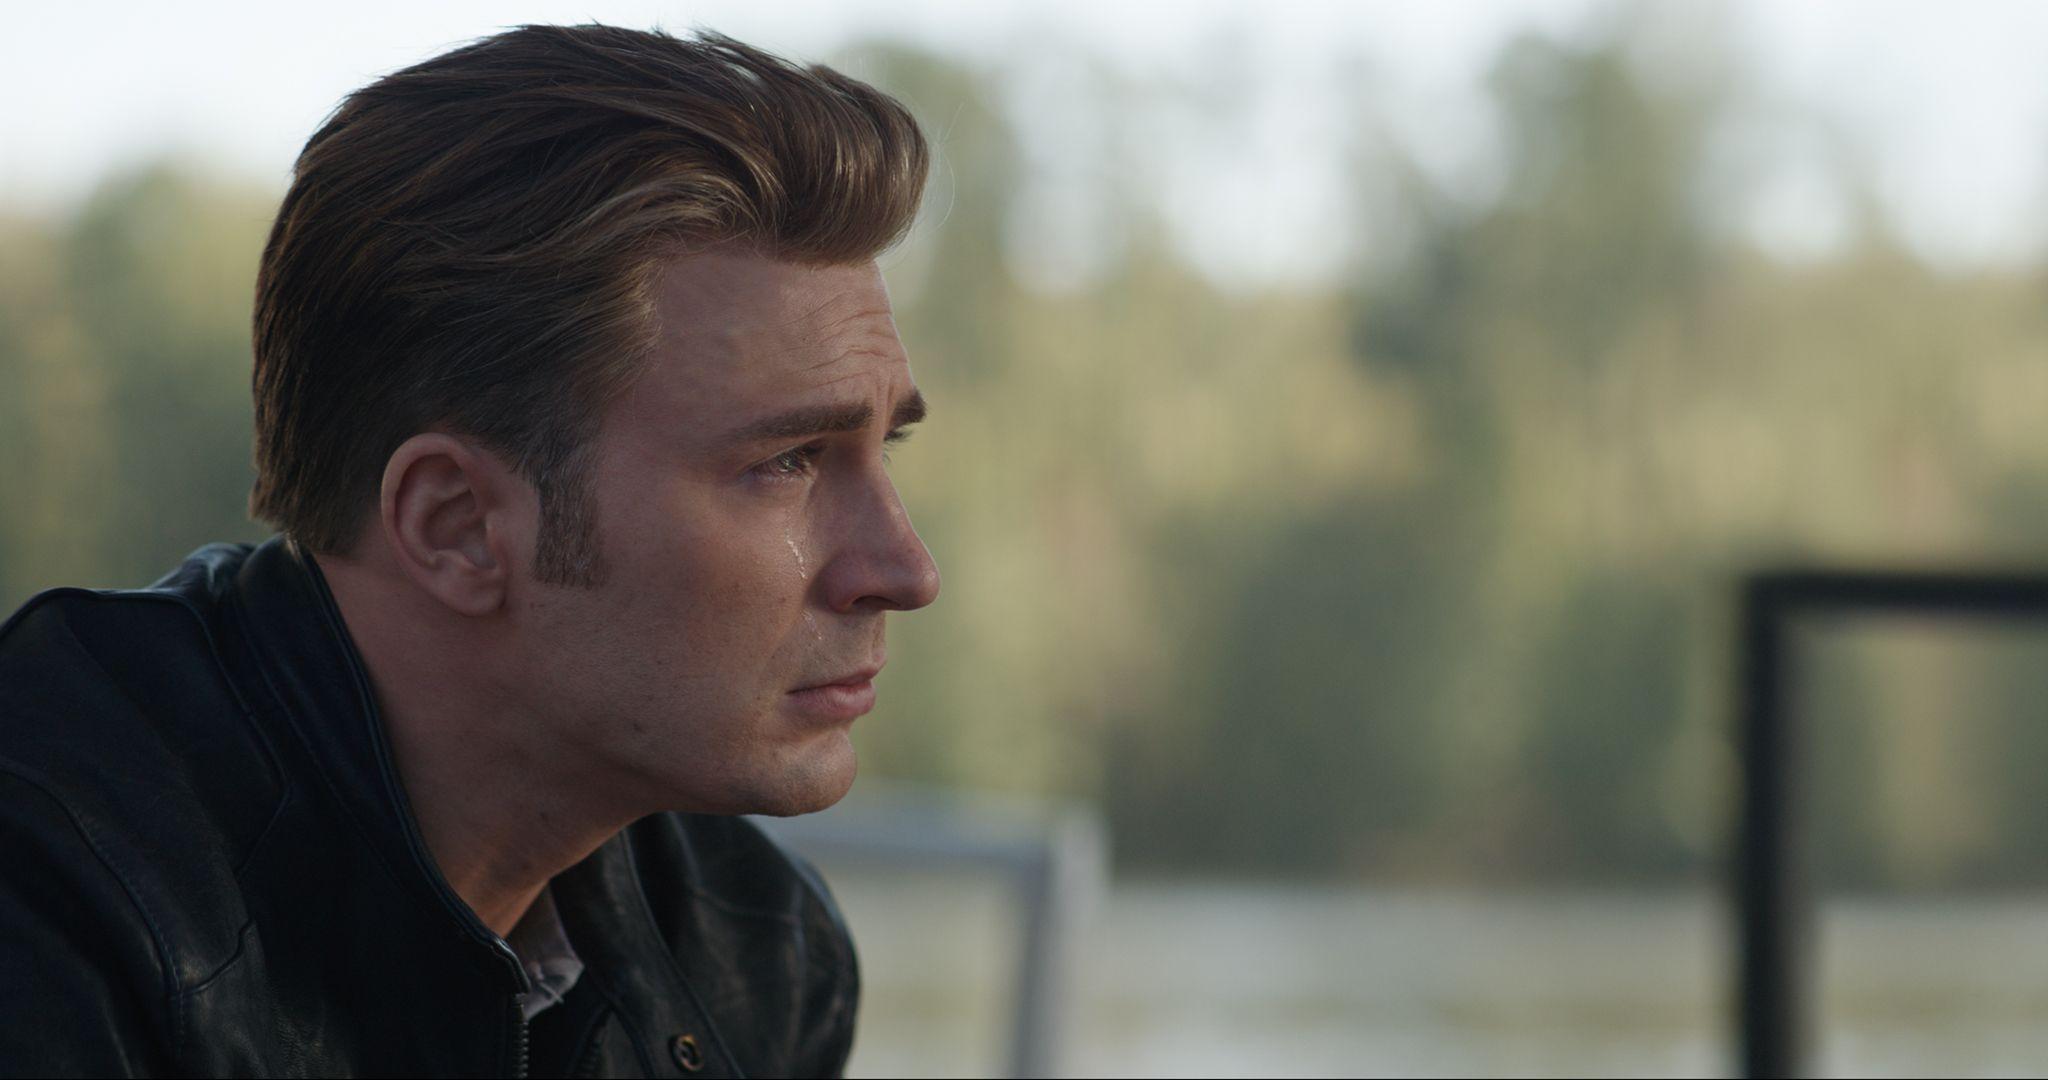 Avengers Endgame Images Sad Chris Evans